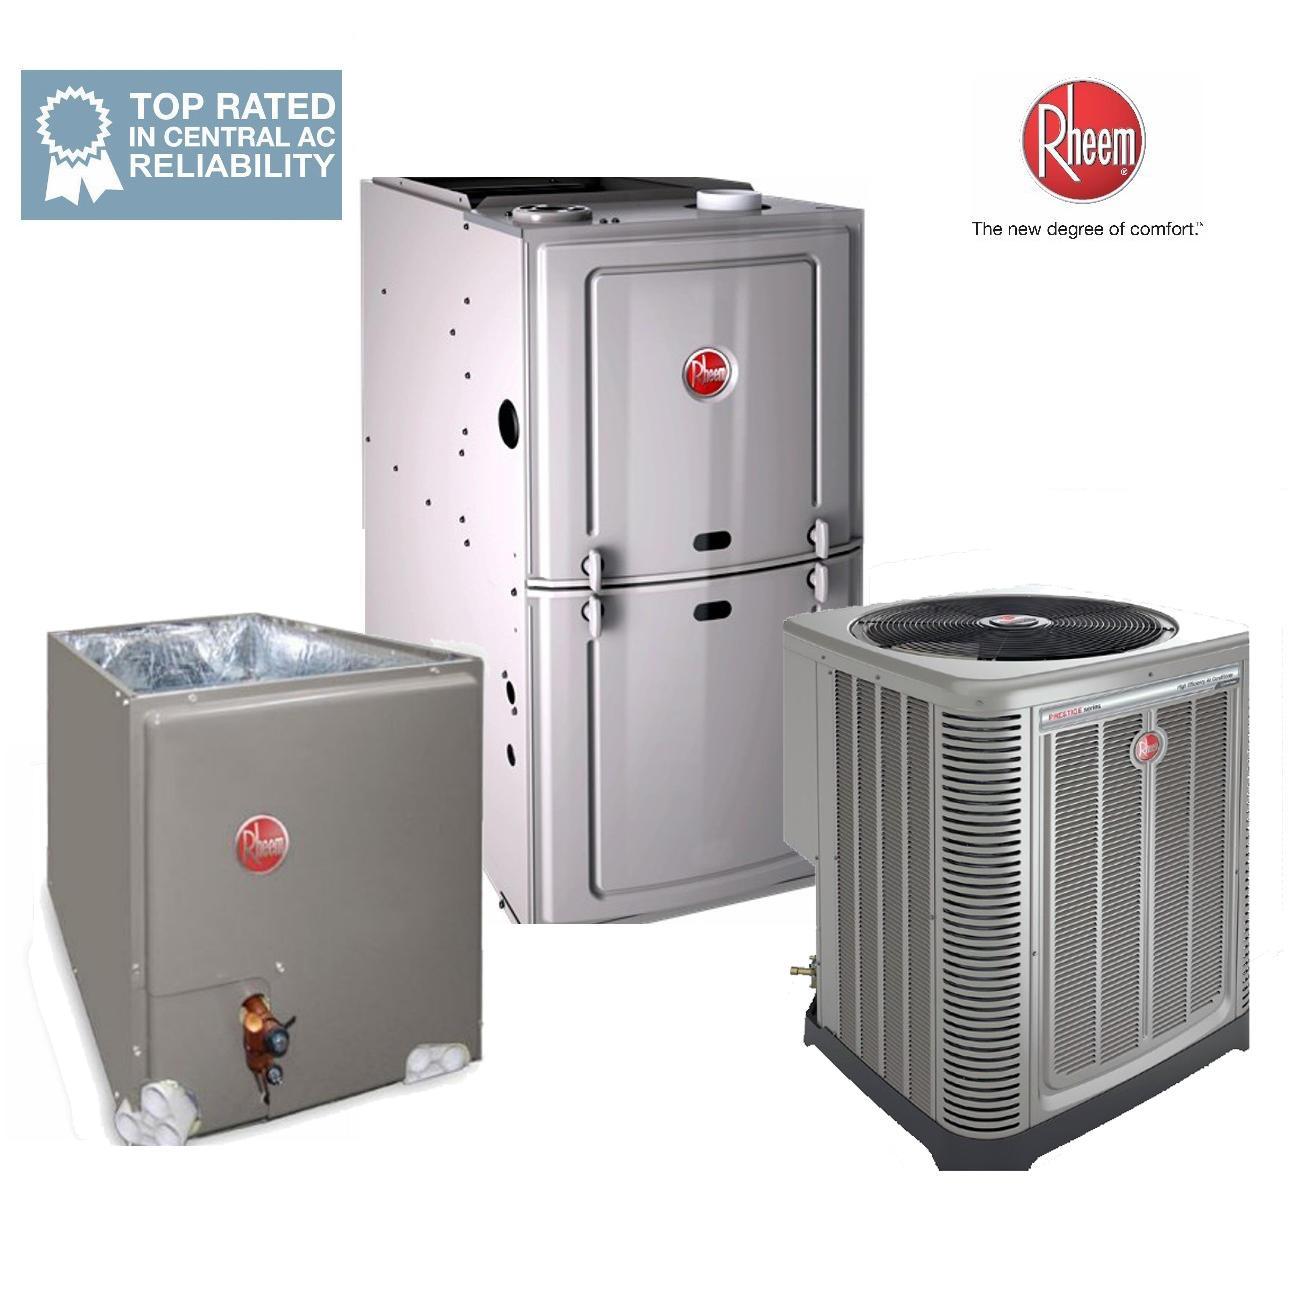 Quality Air Equipment image 1